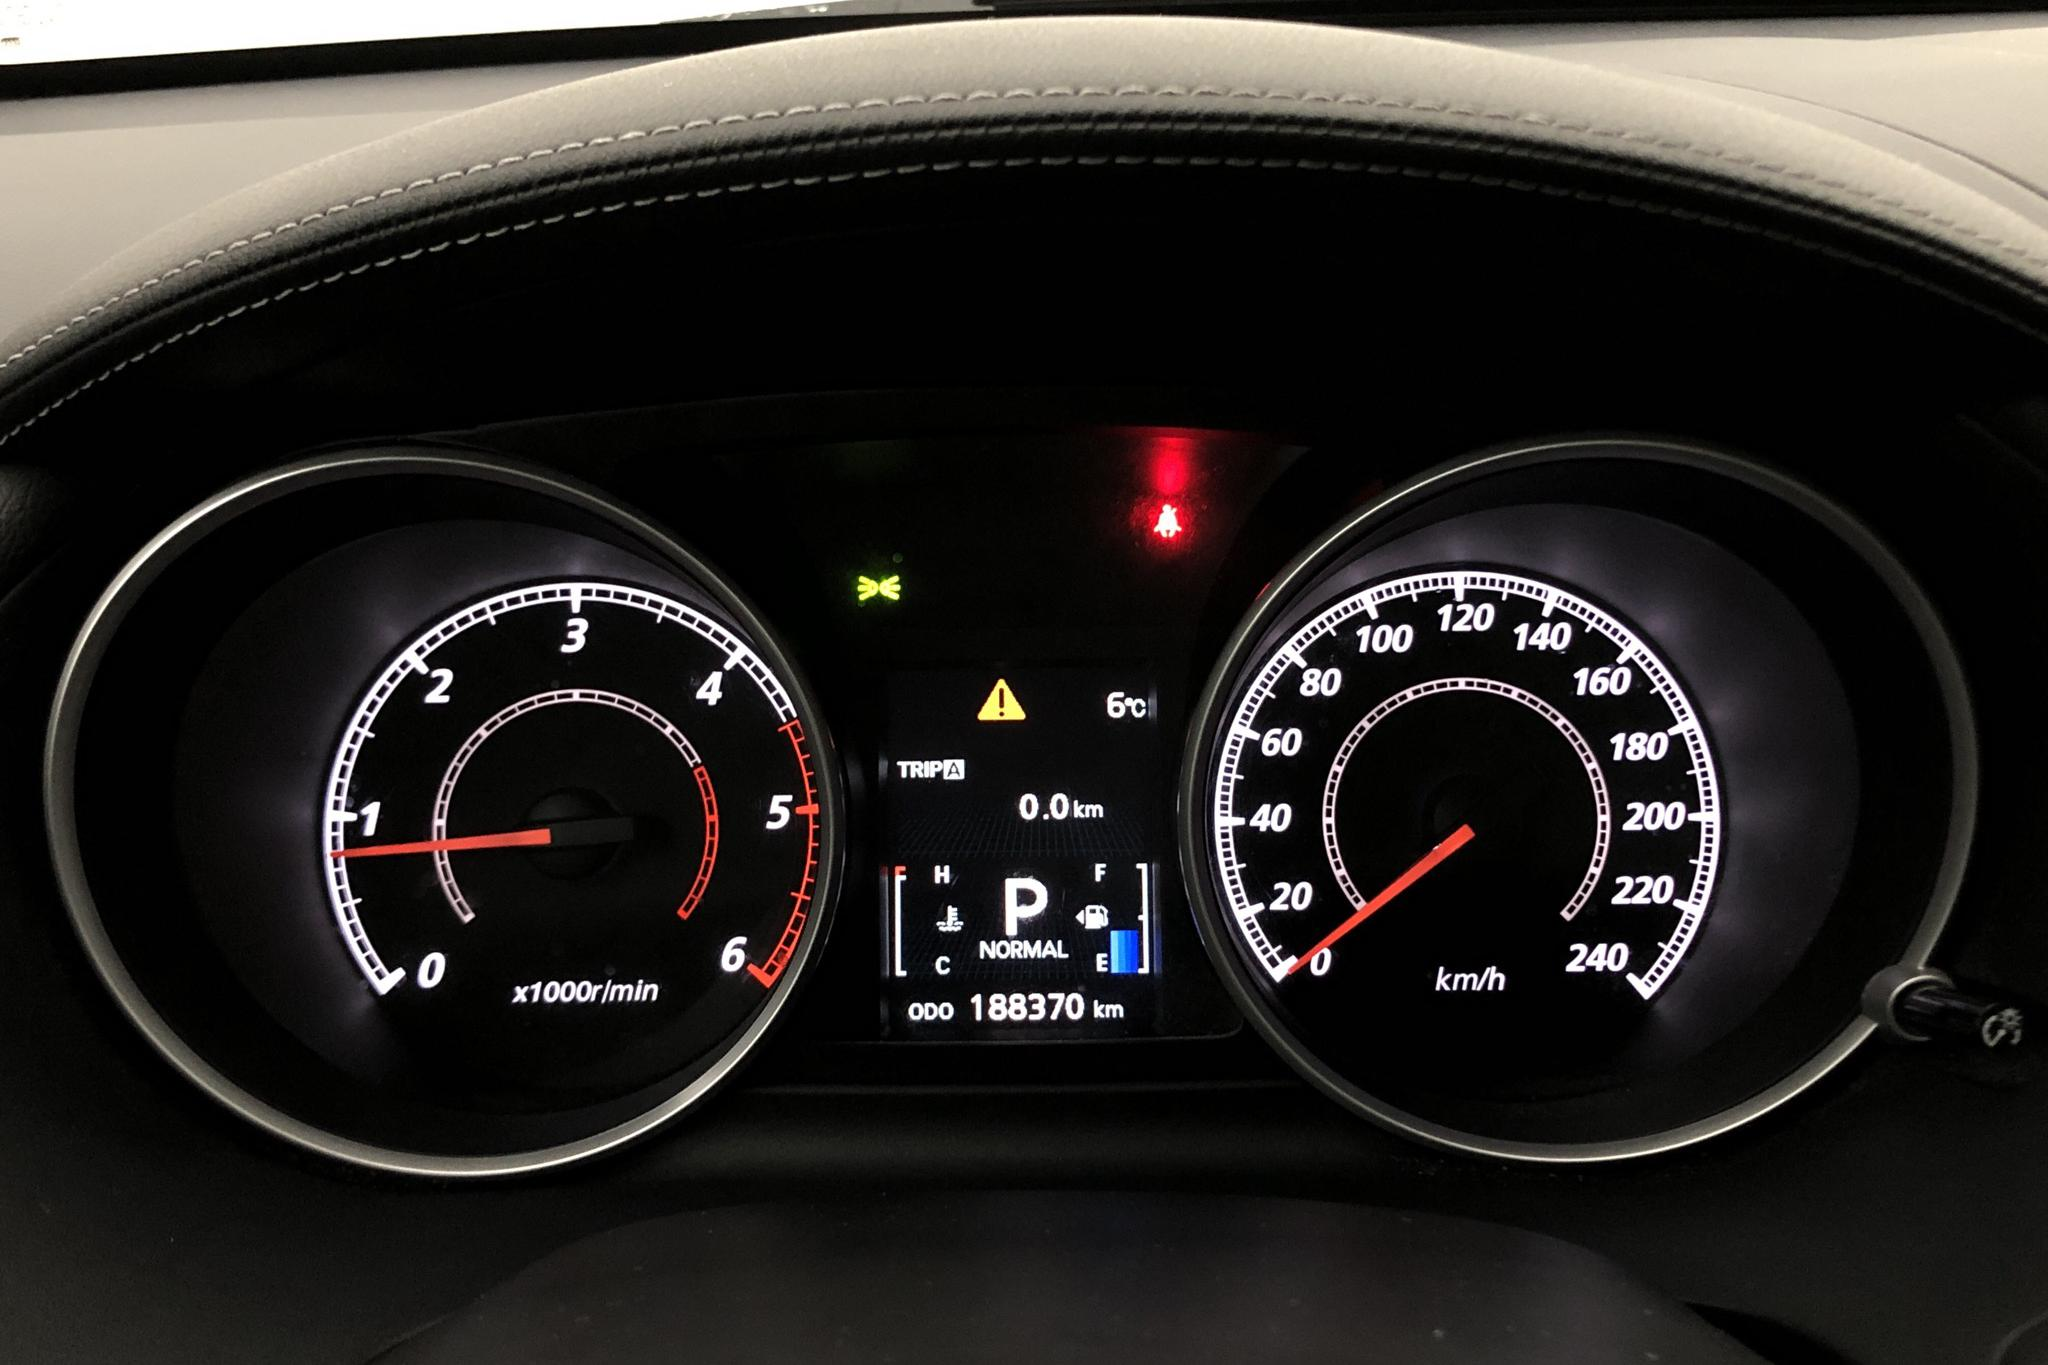 Mitsubishi Outlander 2.2 Di-D (156hk) - 18 900 mil - Automat - brun - 2012